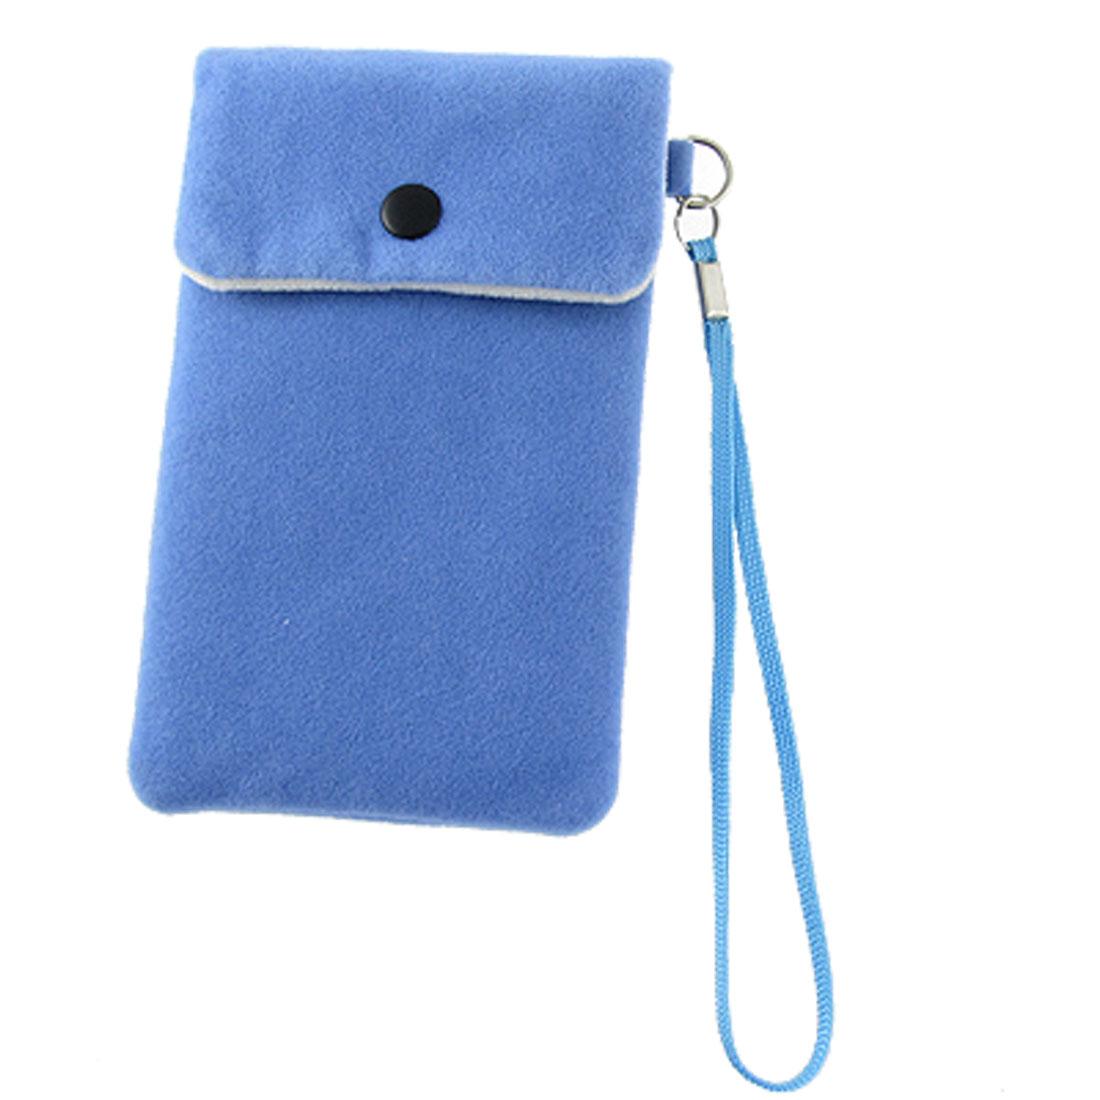 Push Button Sky Blue Velvet Pouch Bag for Cell Phone